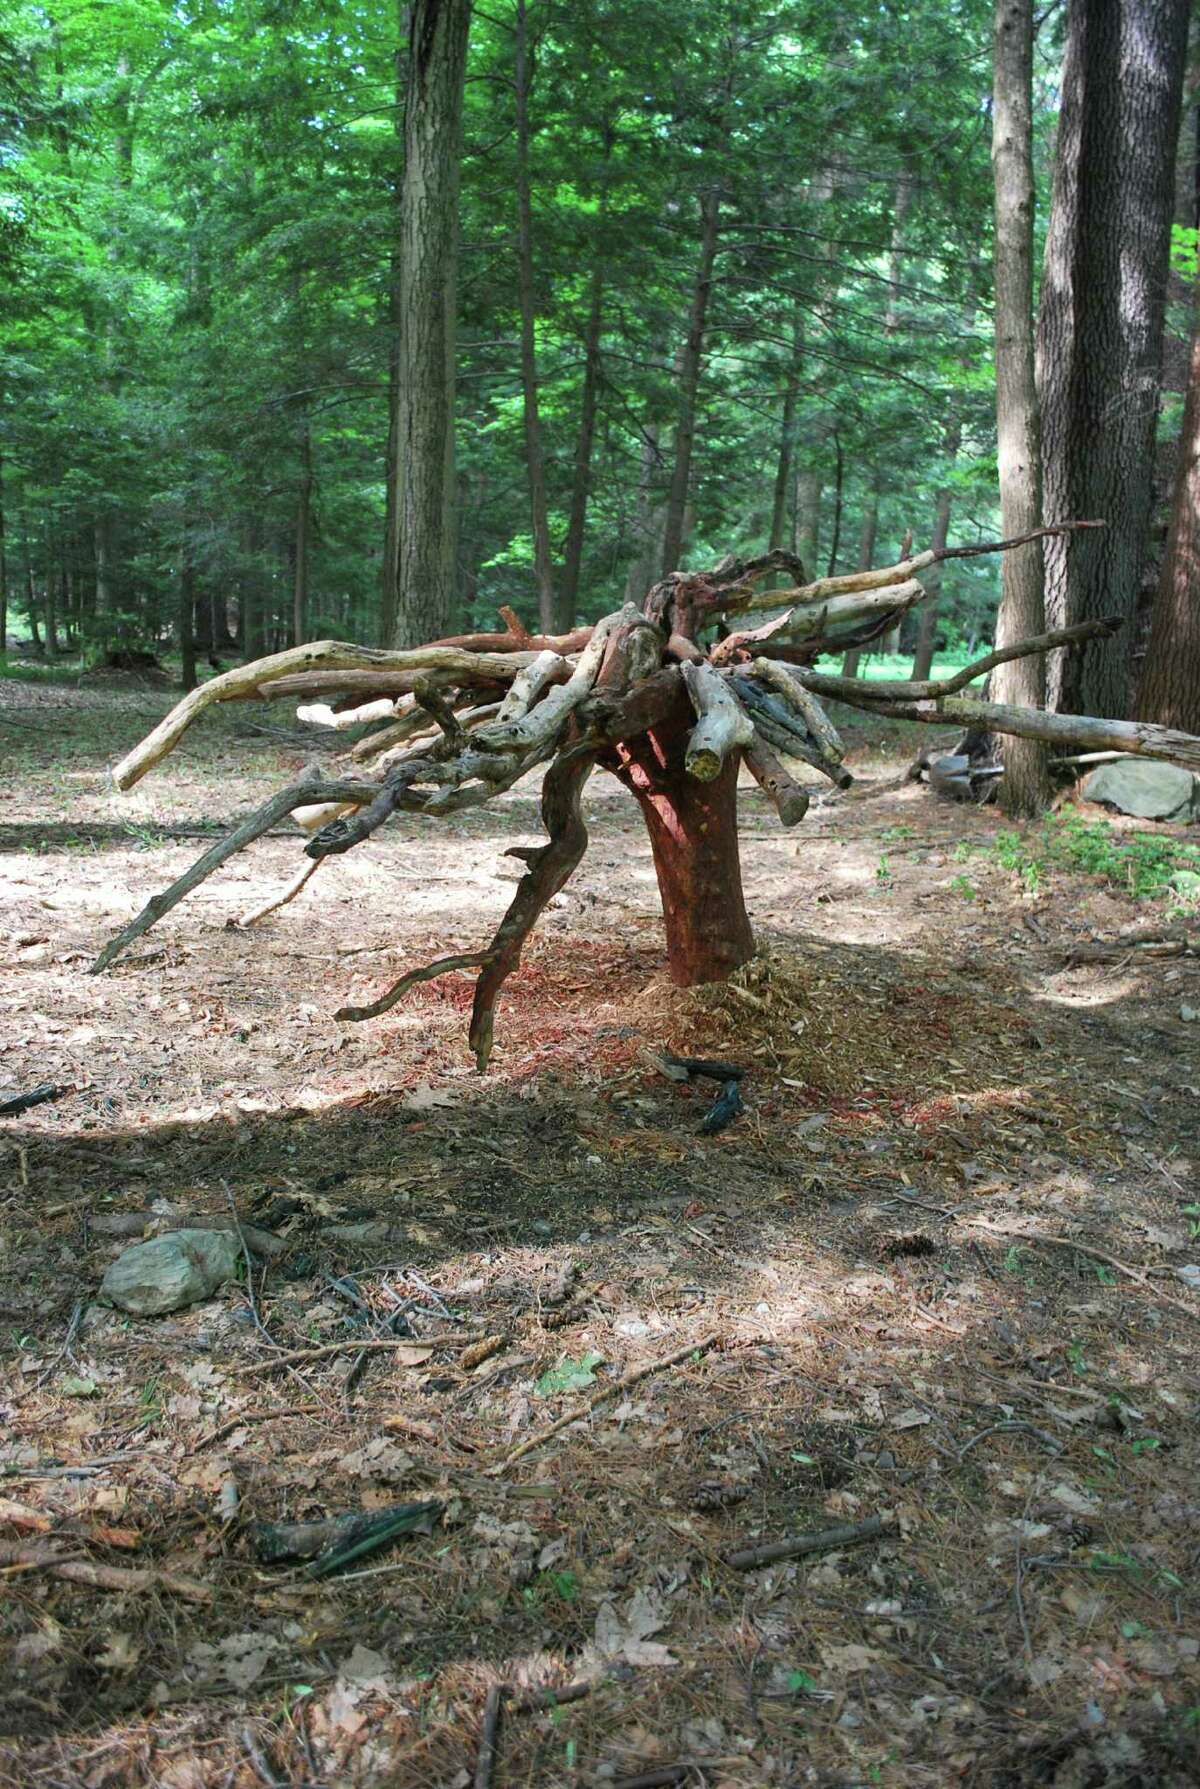 Sarah Langsam - Reversed Destruction is part of